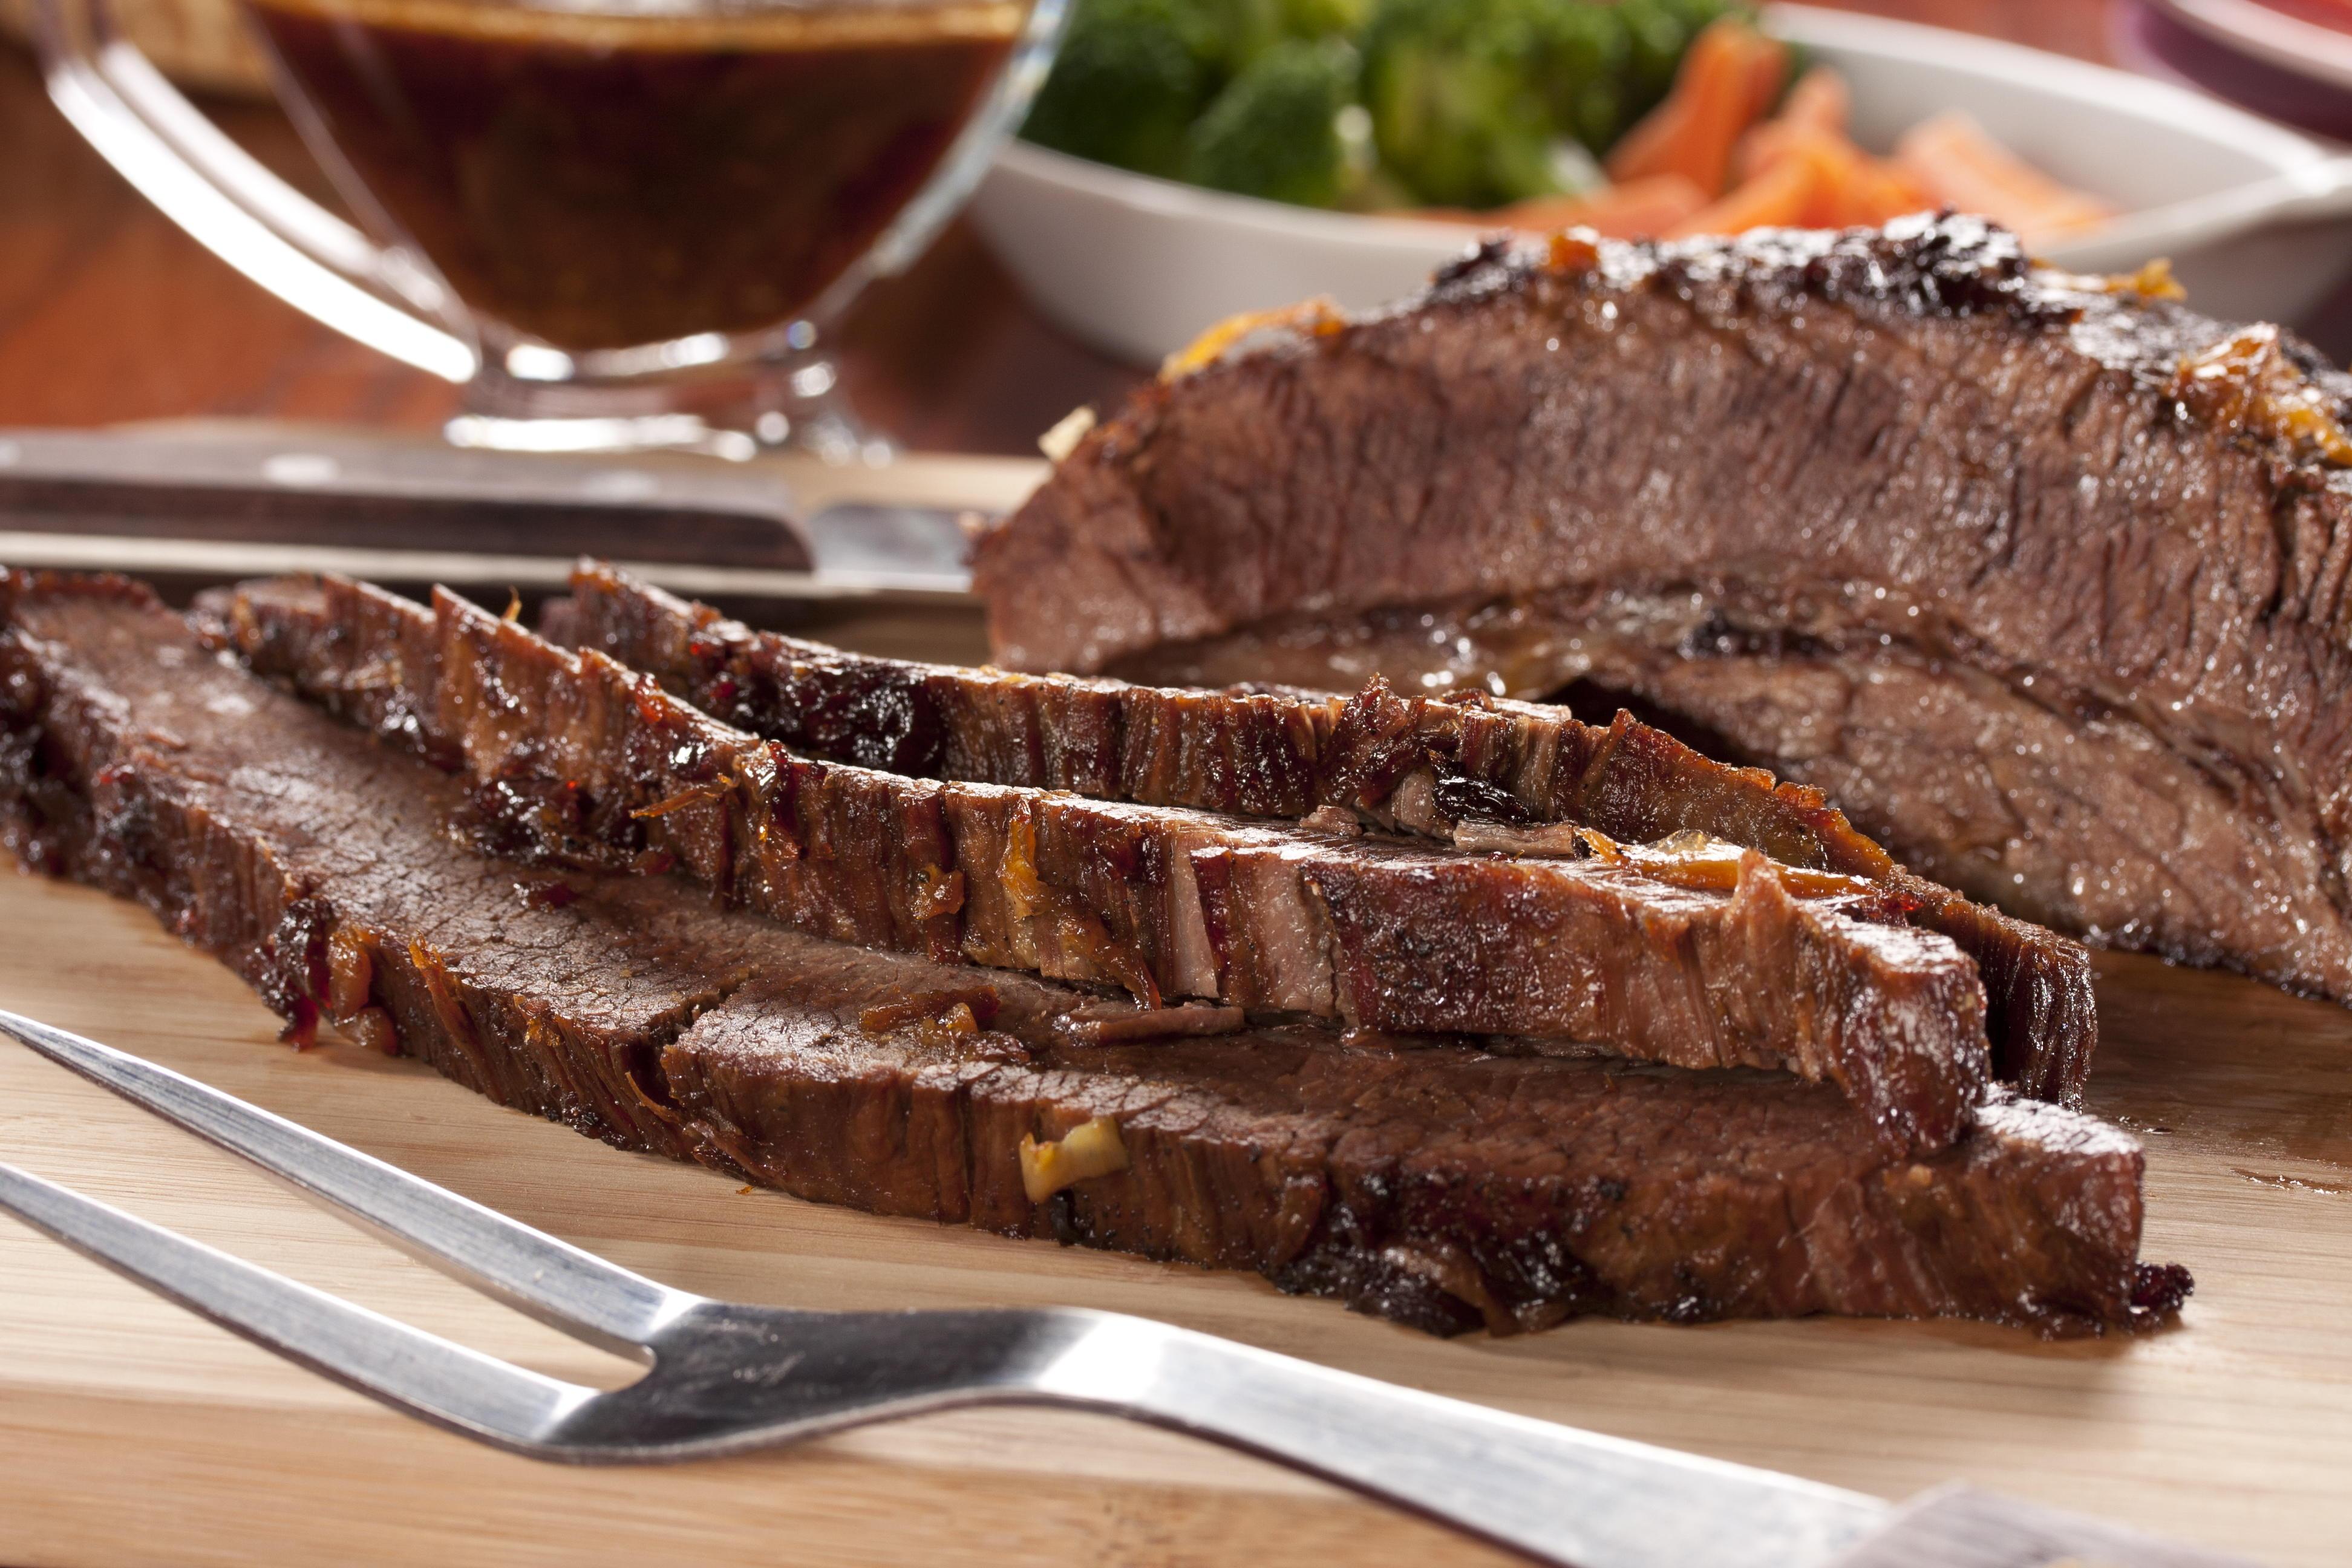 Beef Brisket With Horseradish Sauce Mrfood Com